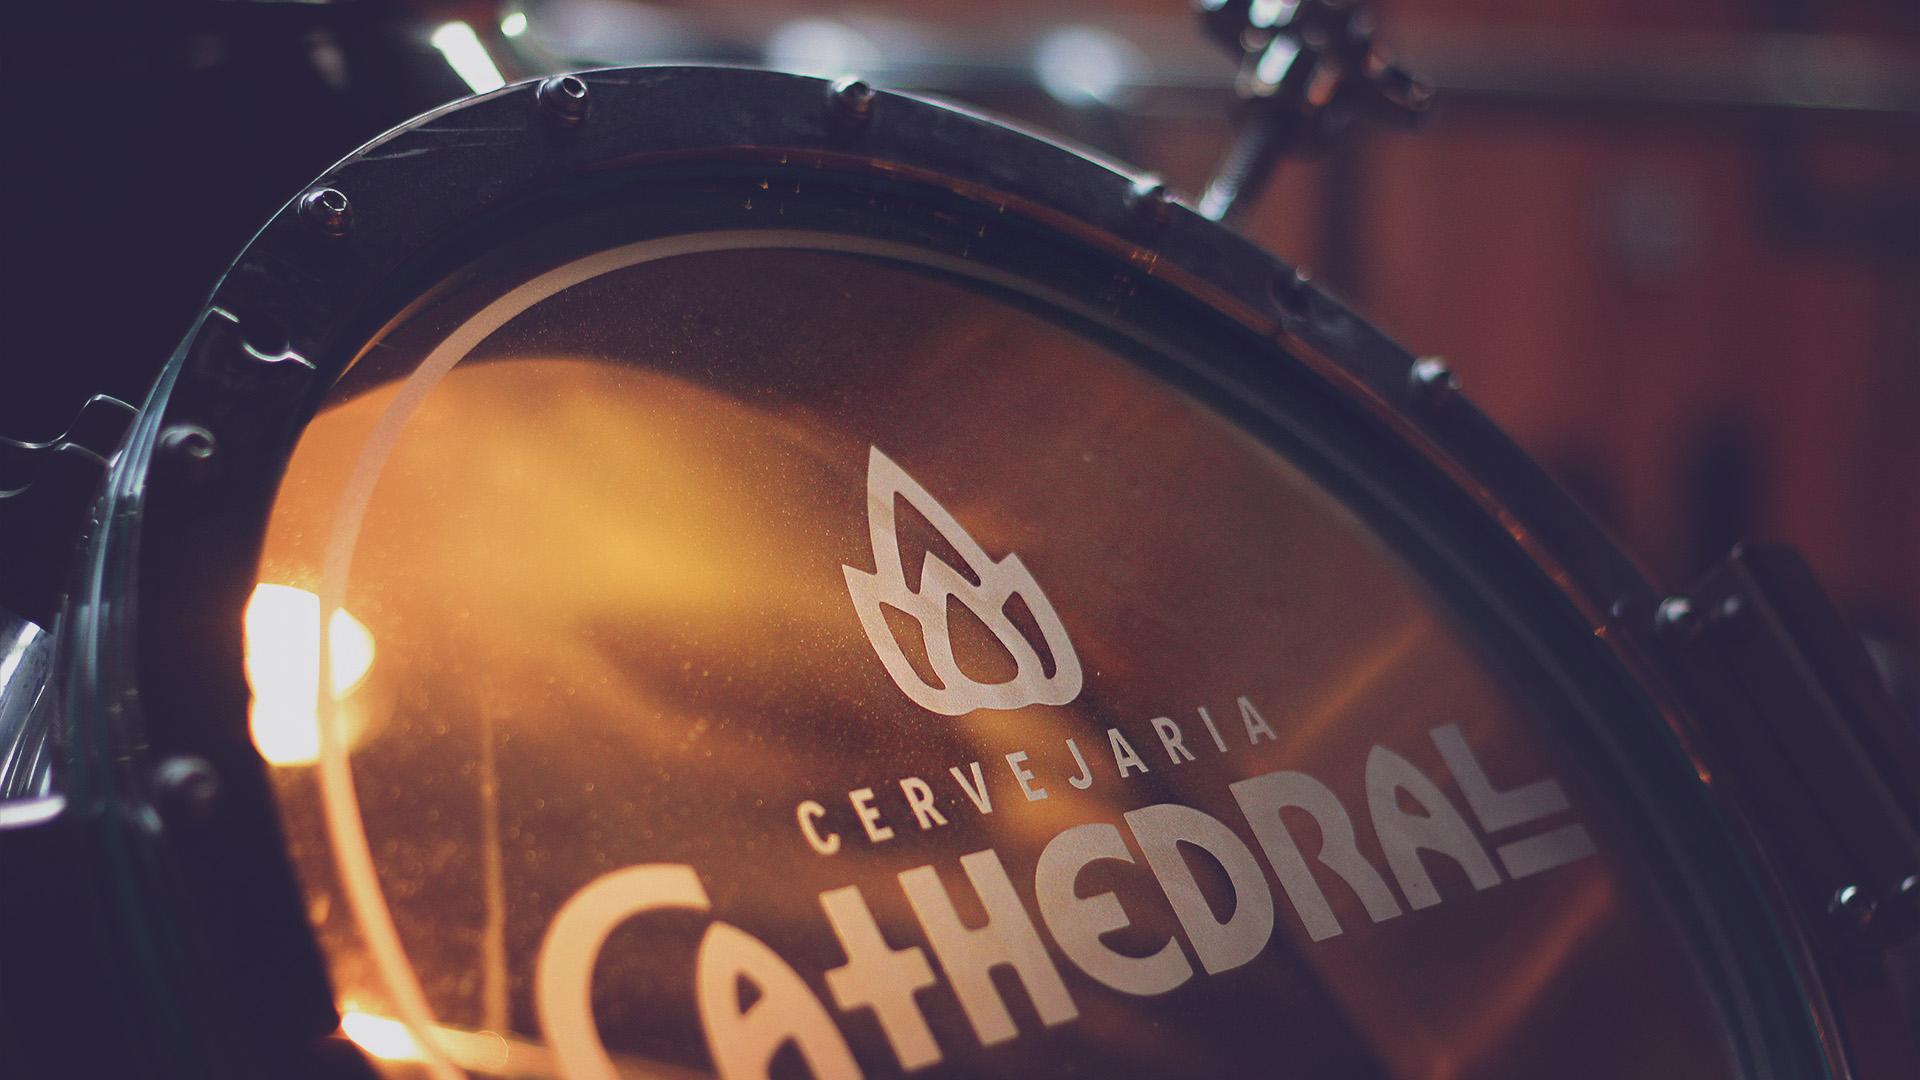 Brandigno - Cervejaria Cathedral Label2.jpg